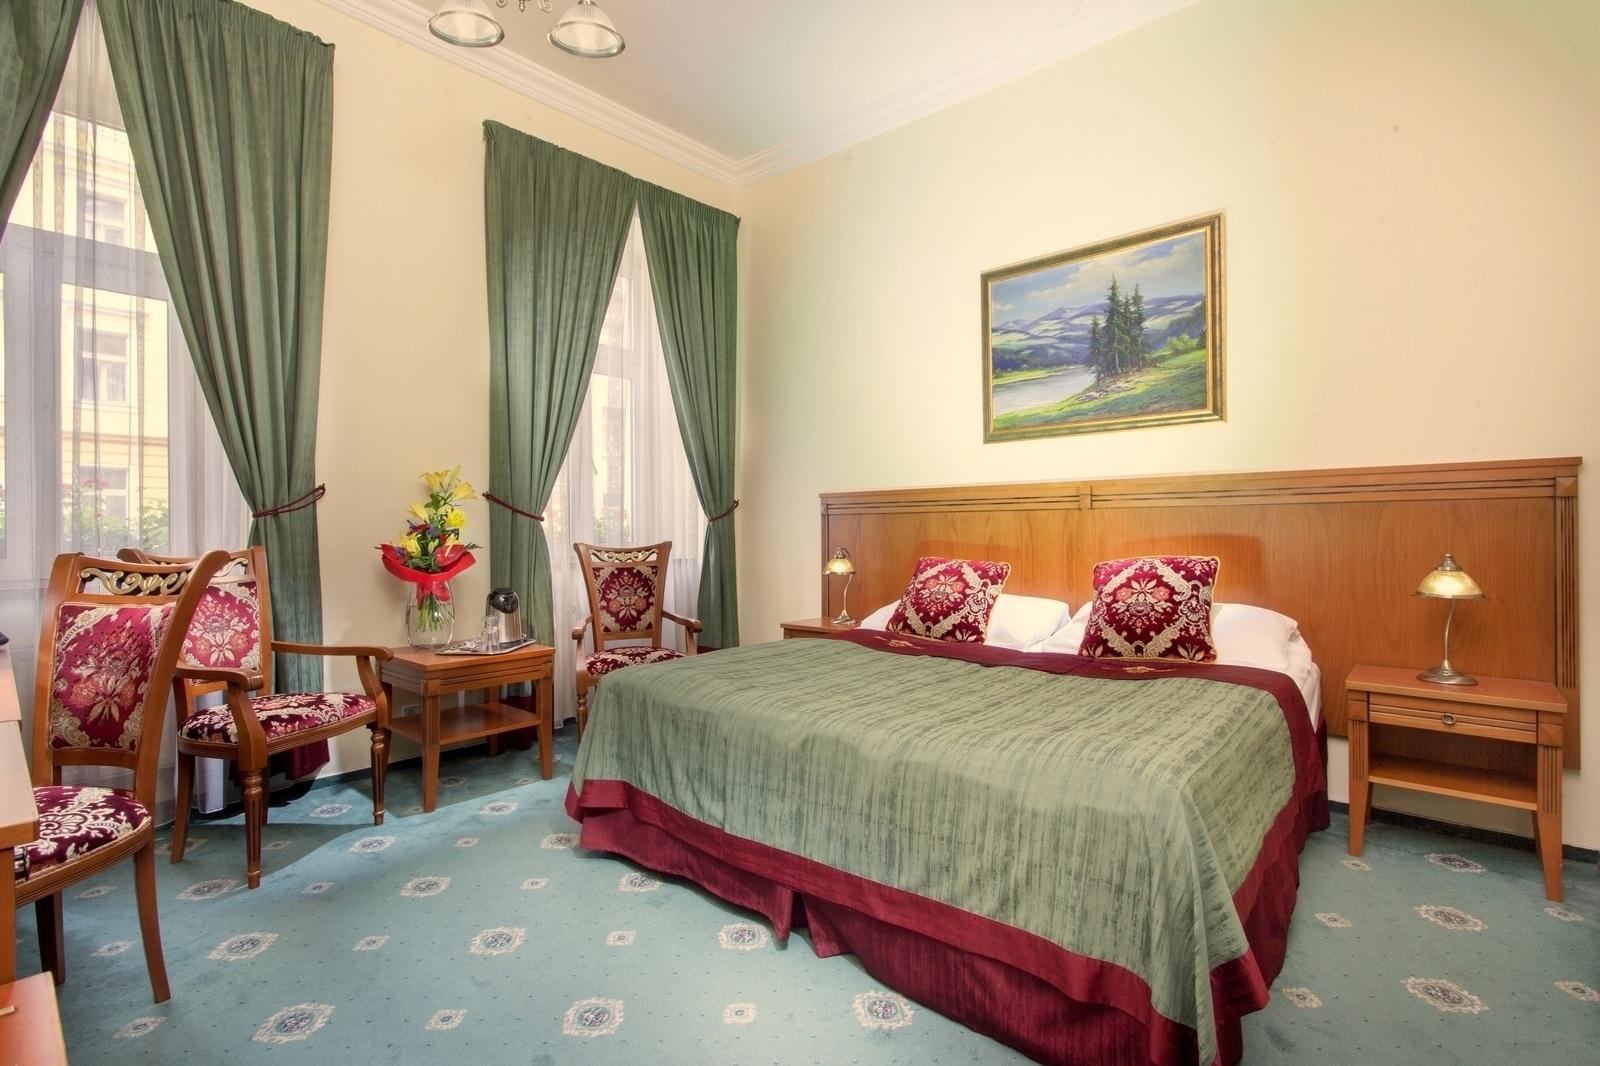 Rooms at hotel green garden hotel accommodation prague for Green garden rooms